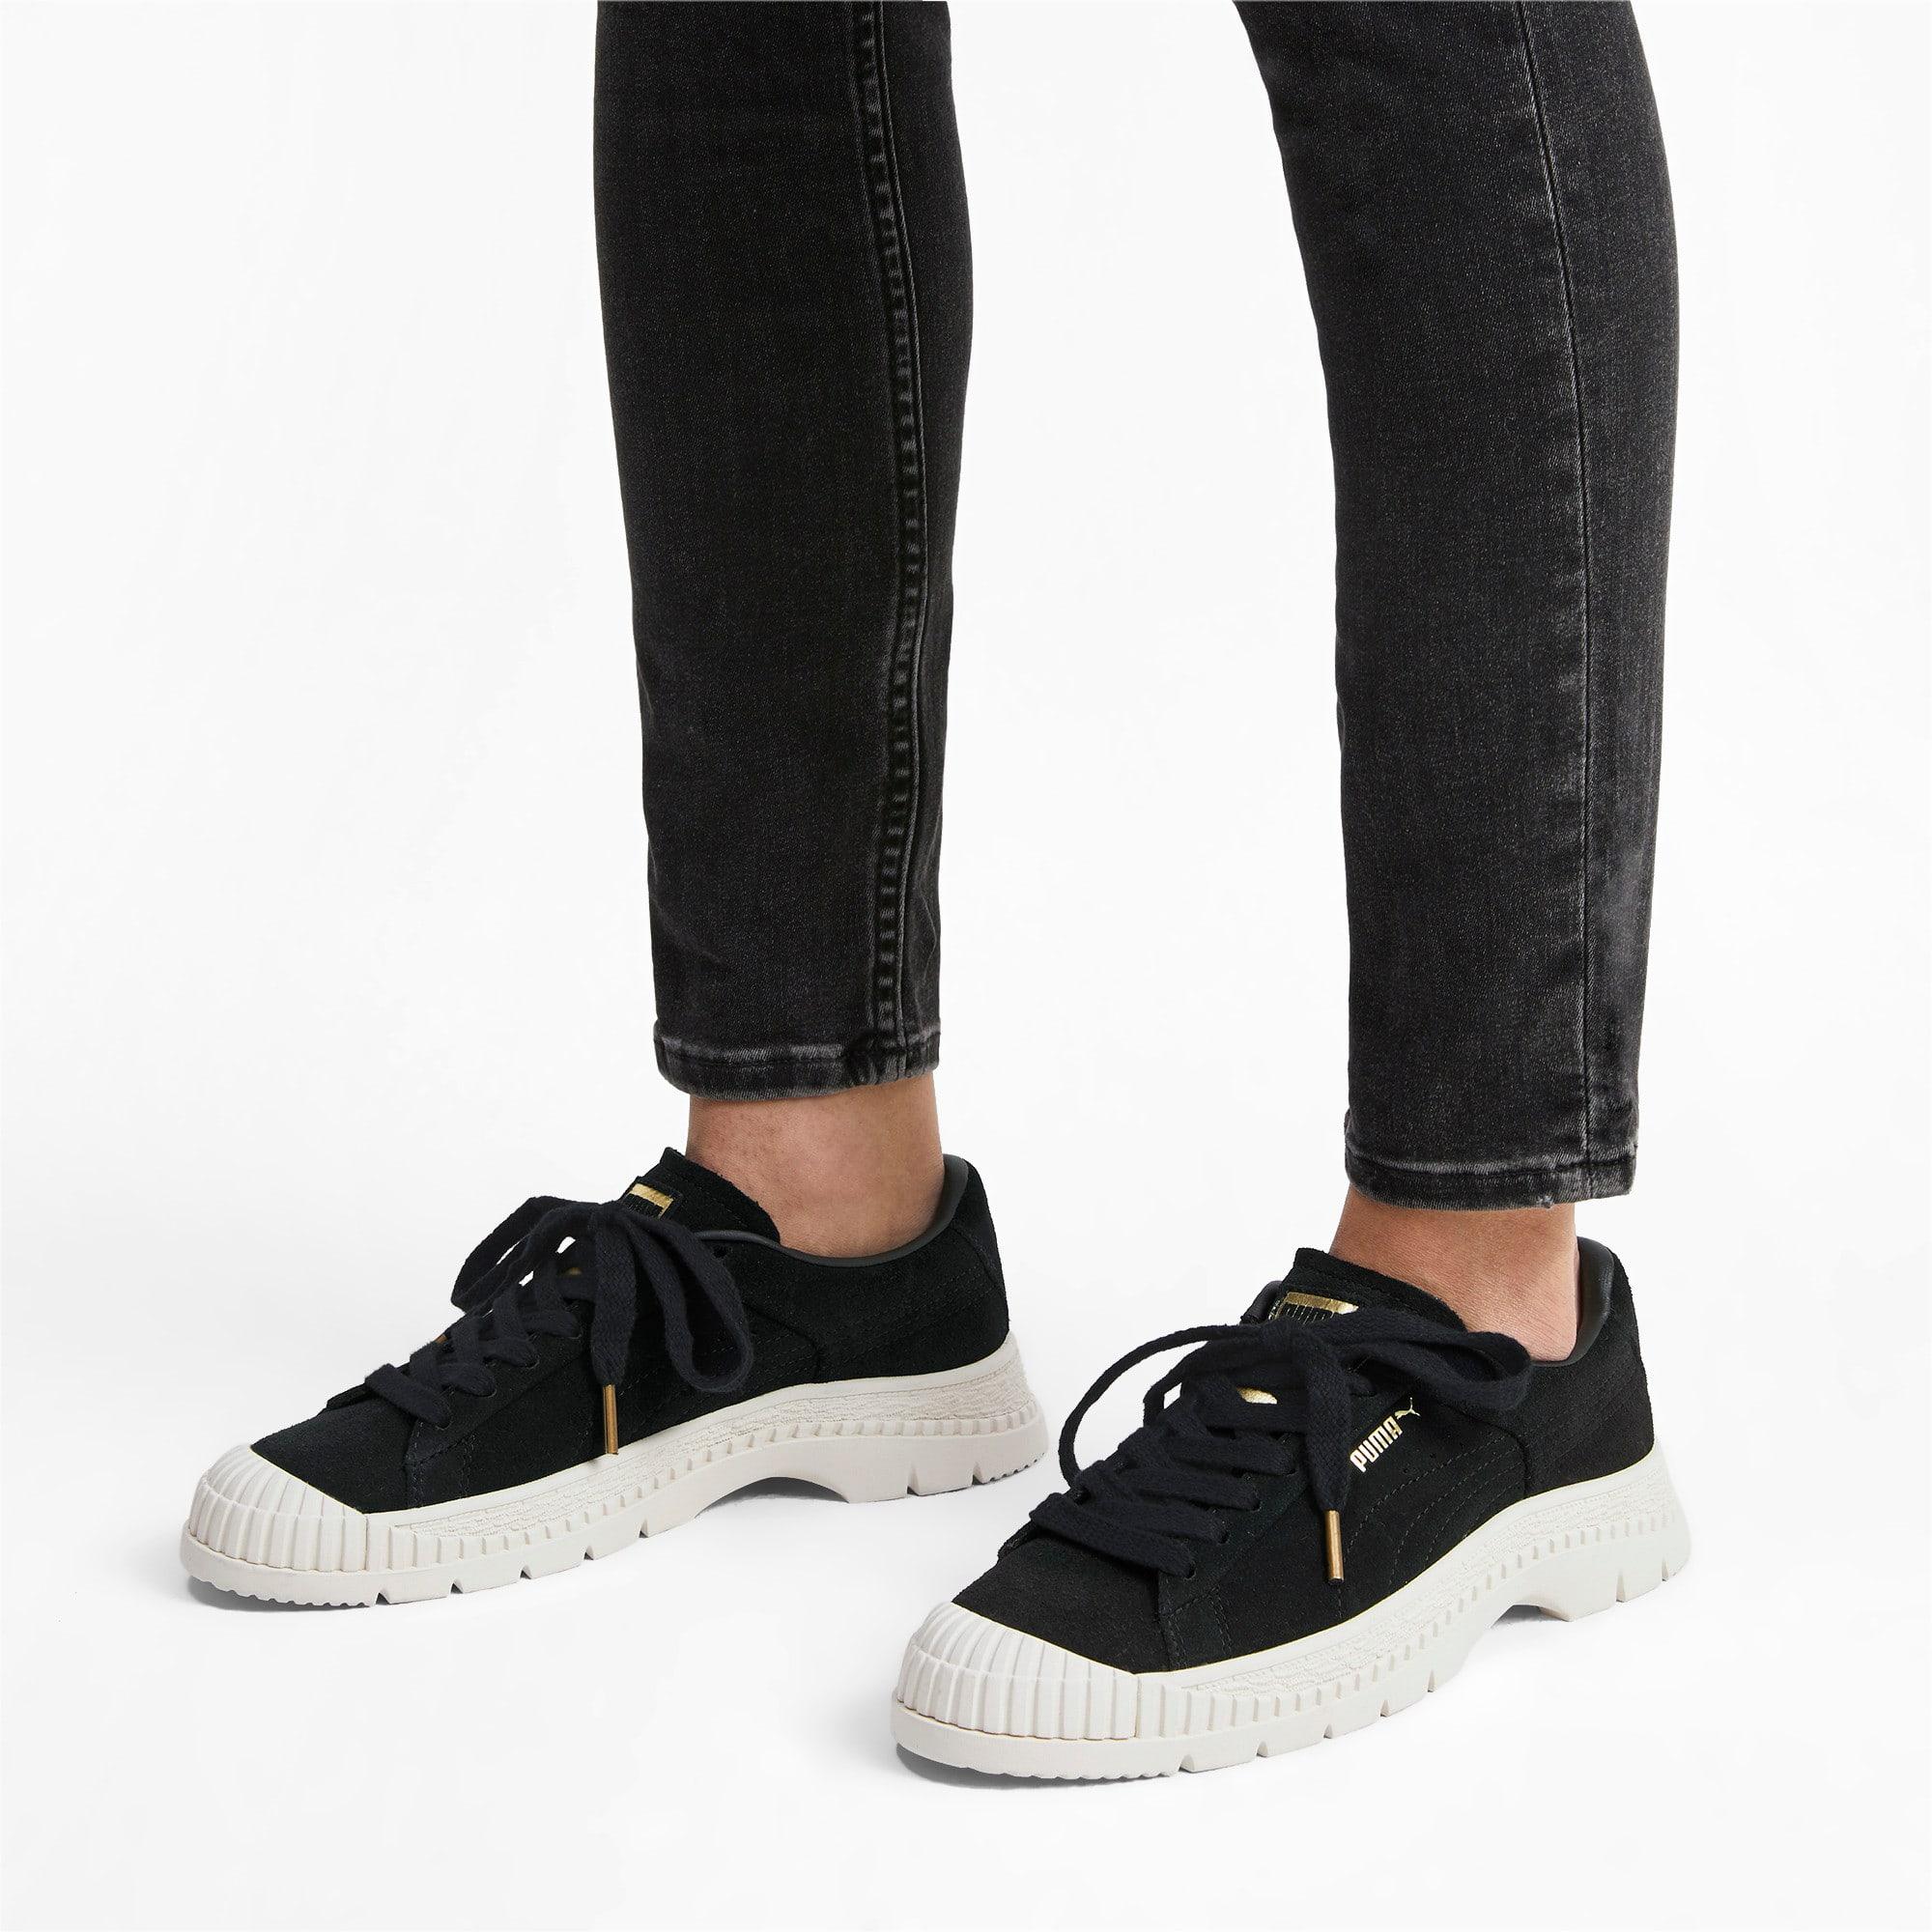 Thumbnail 3 of Utility Suede Women's Sneakers, Puma Black, medium